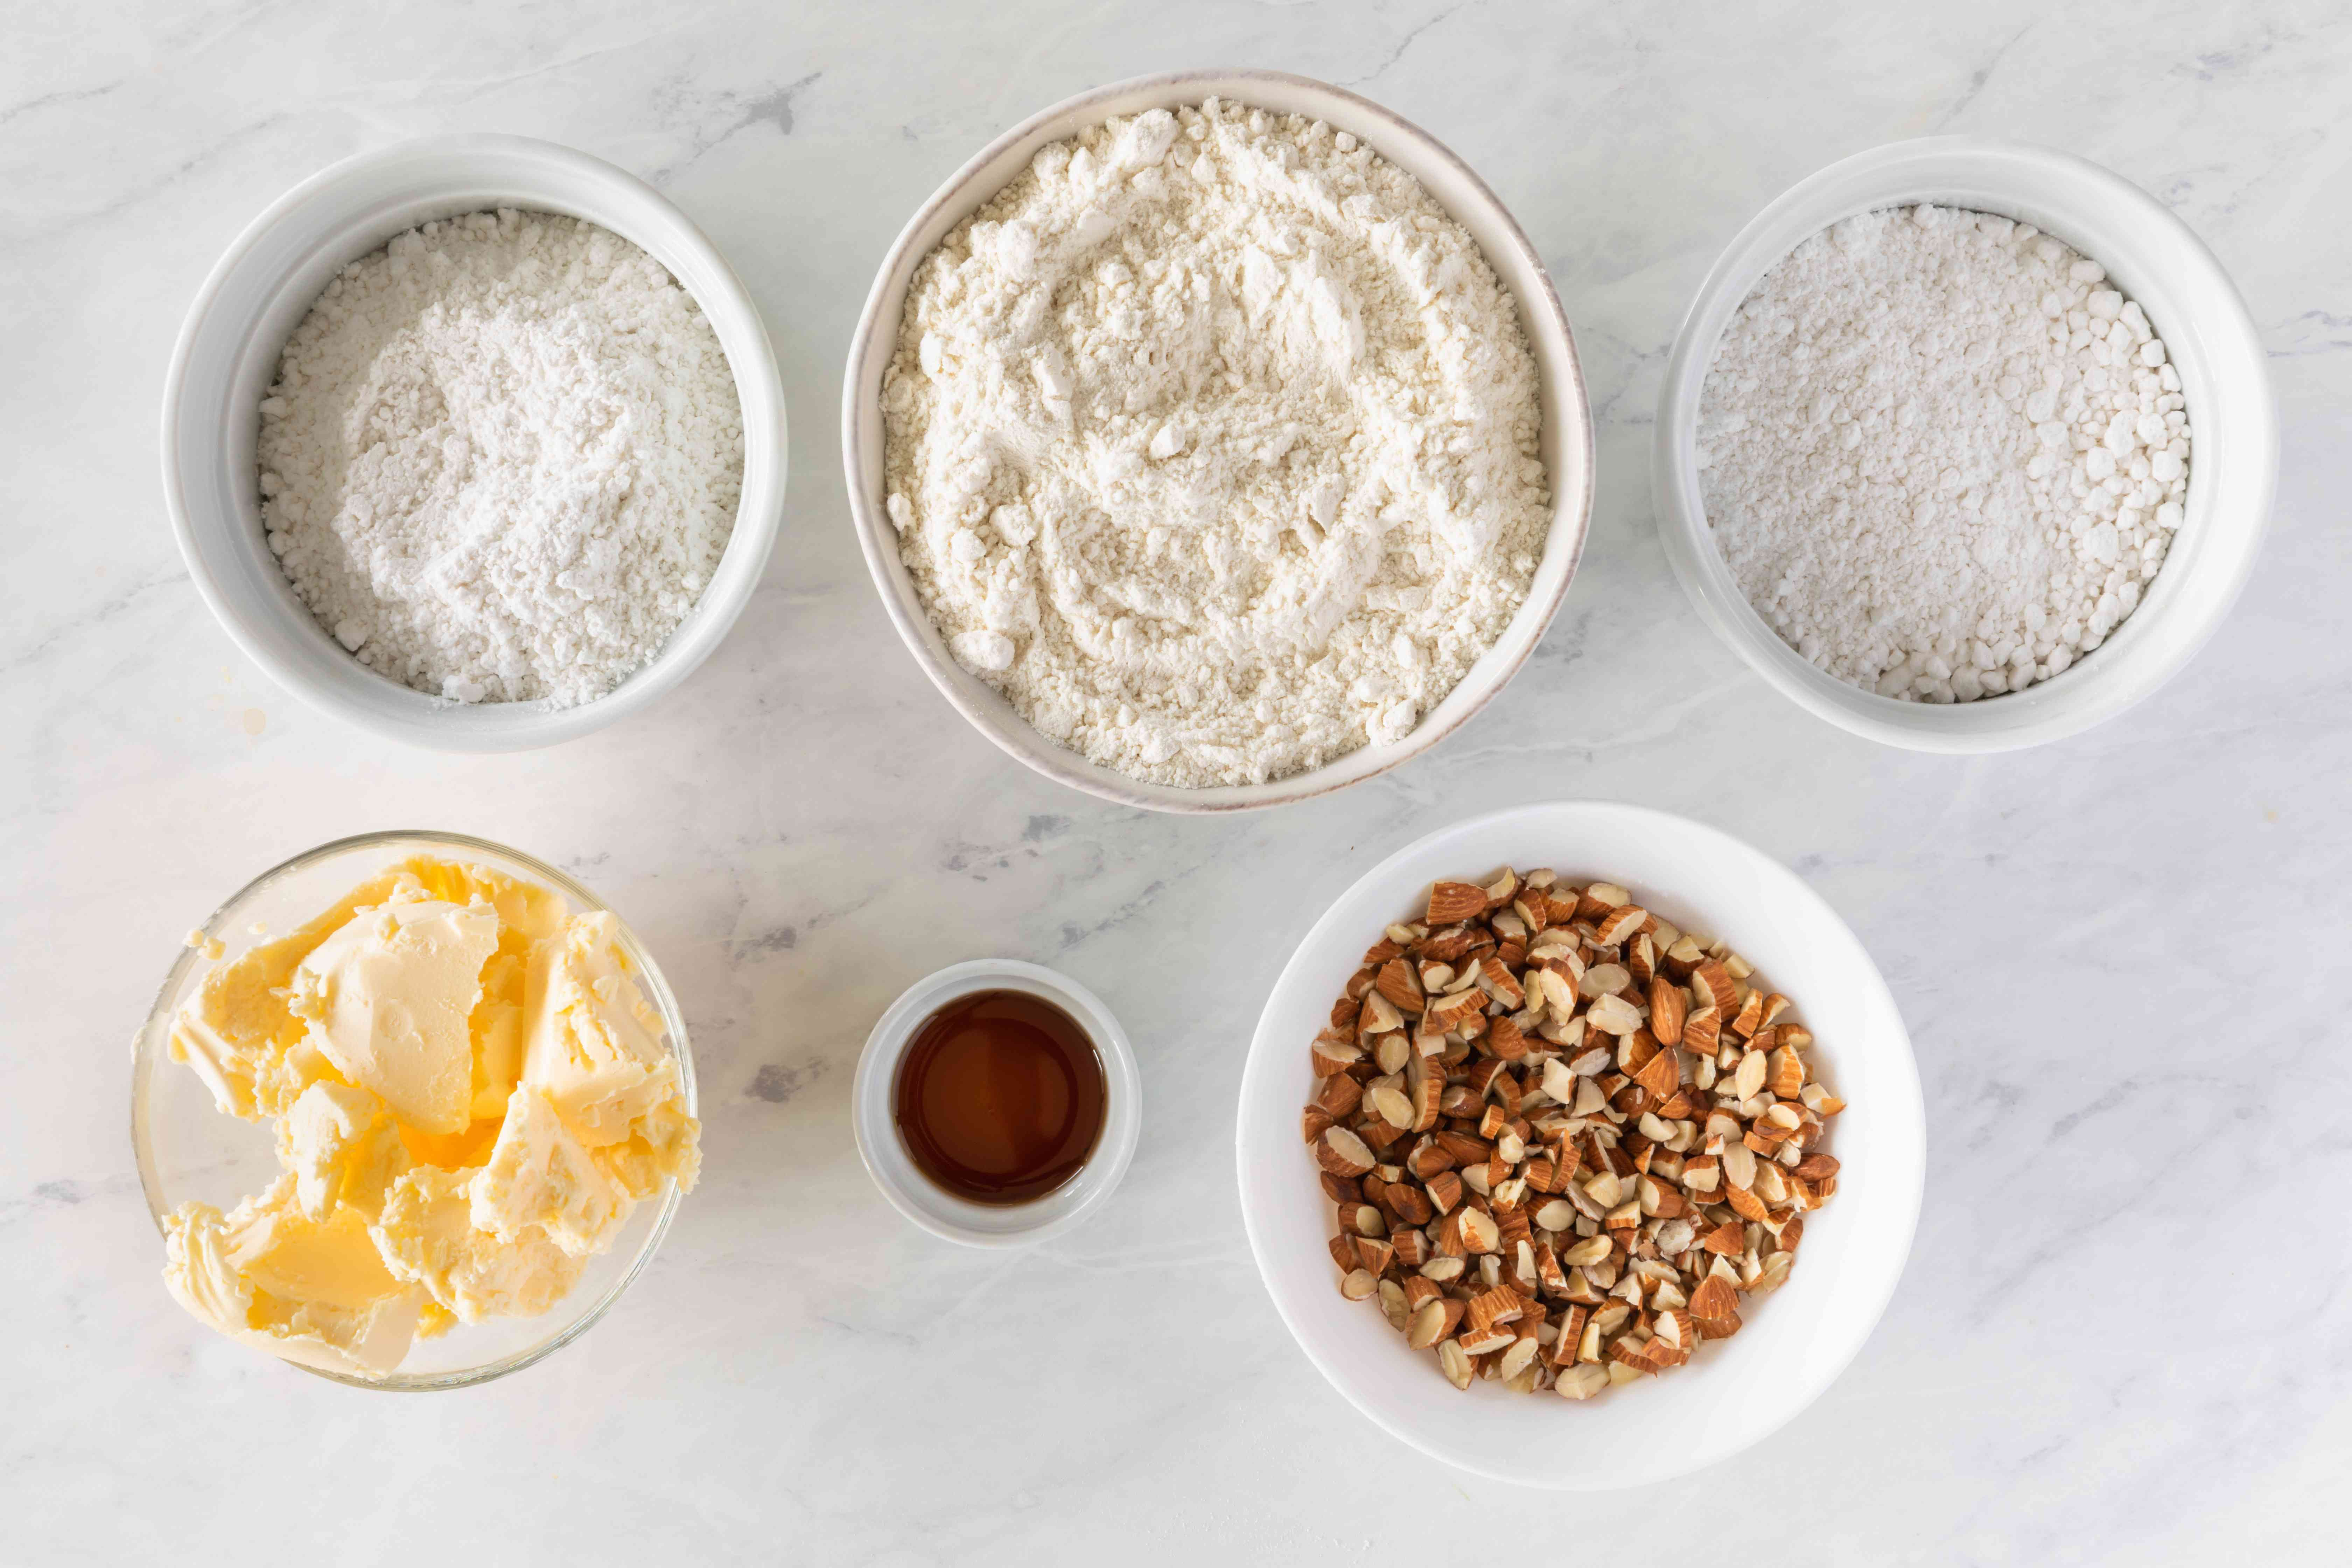 Ingredients for vegan Russian tea cakes